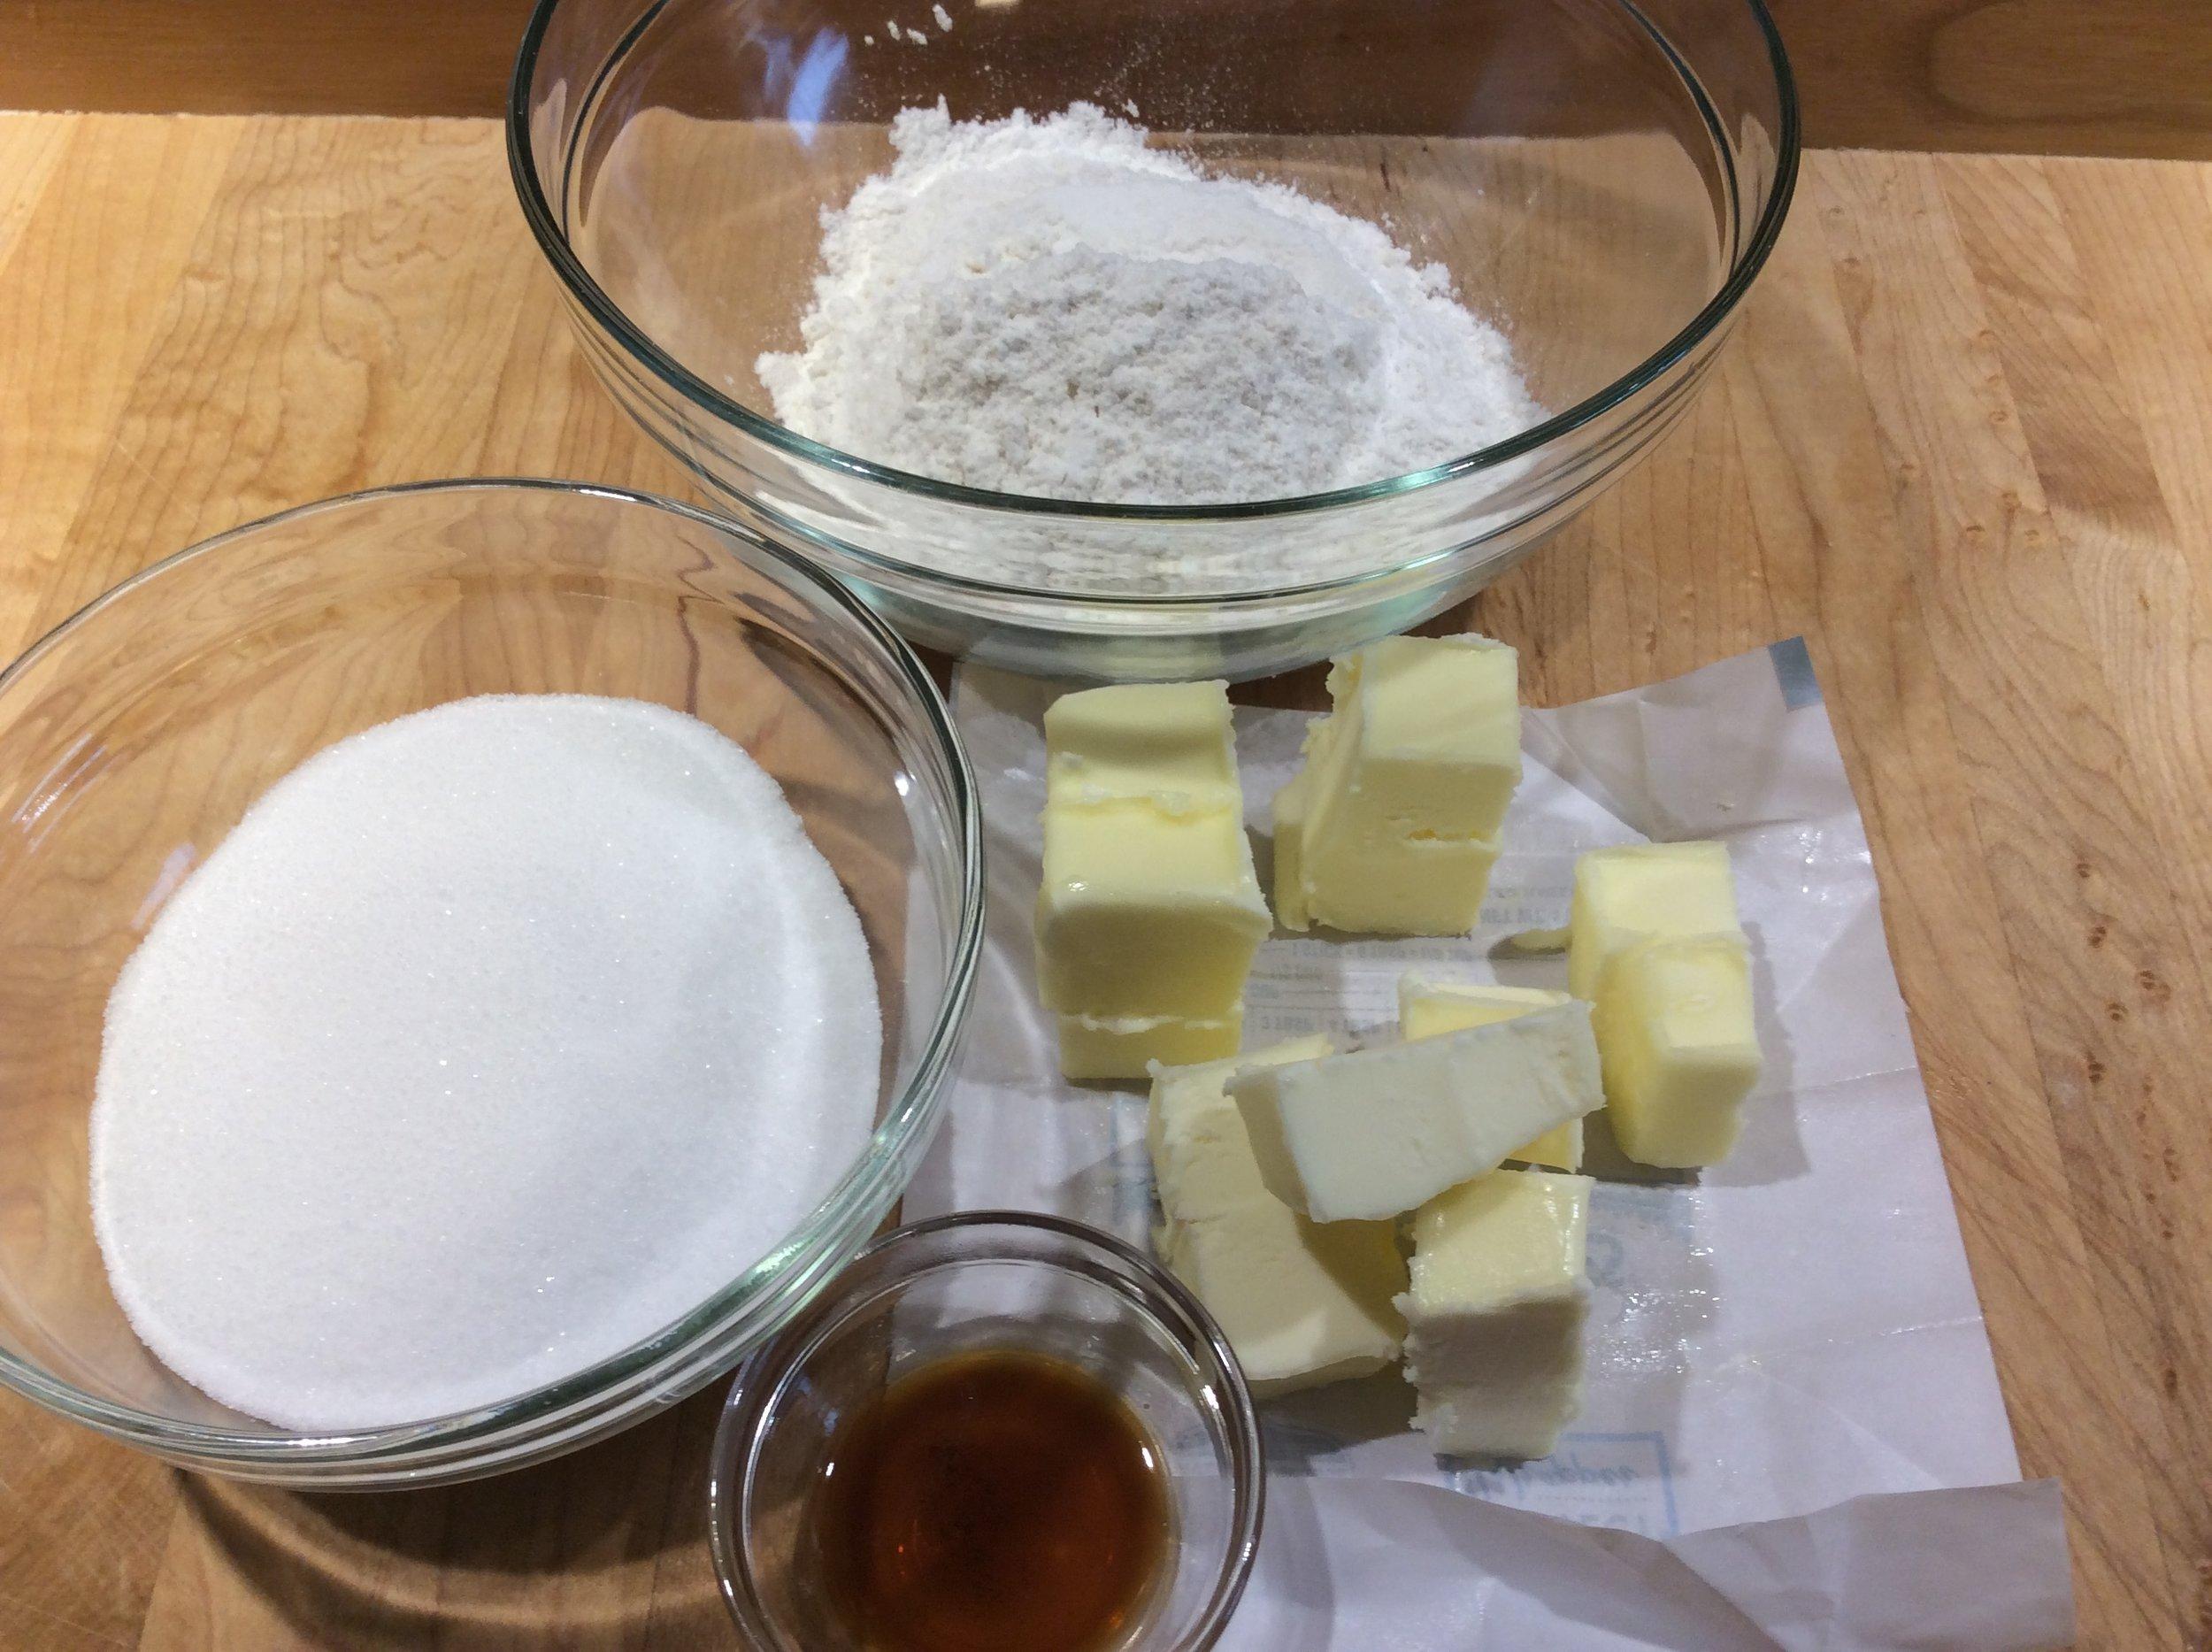 Butter Streusel Mise en Place